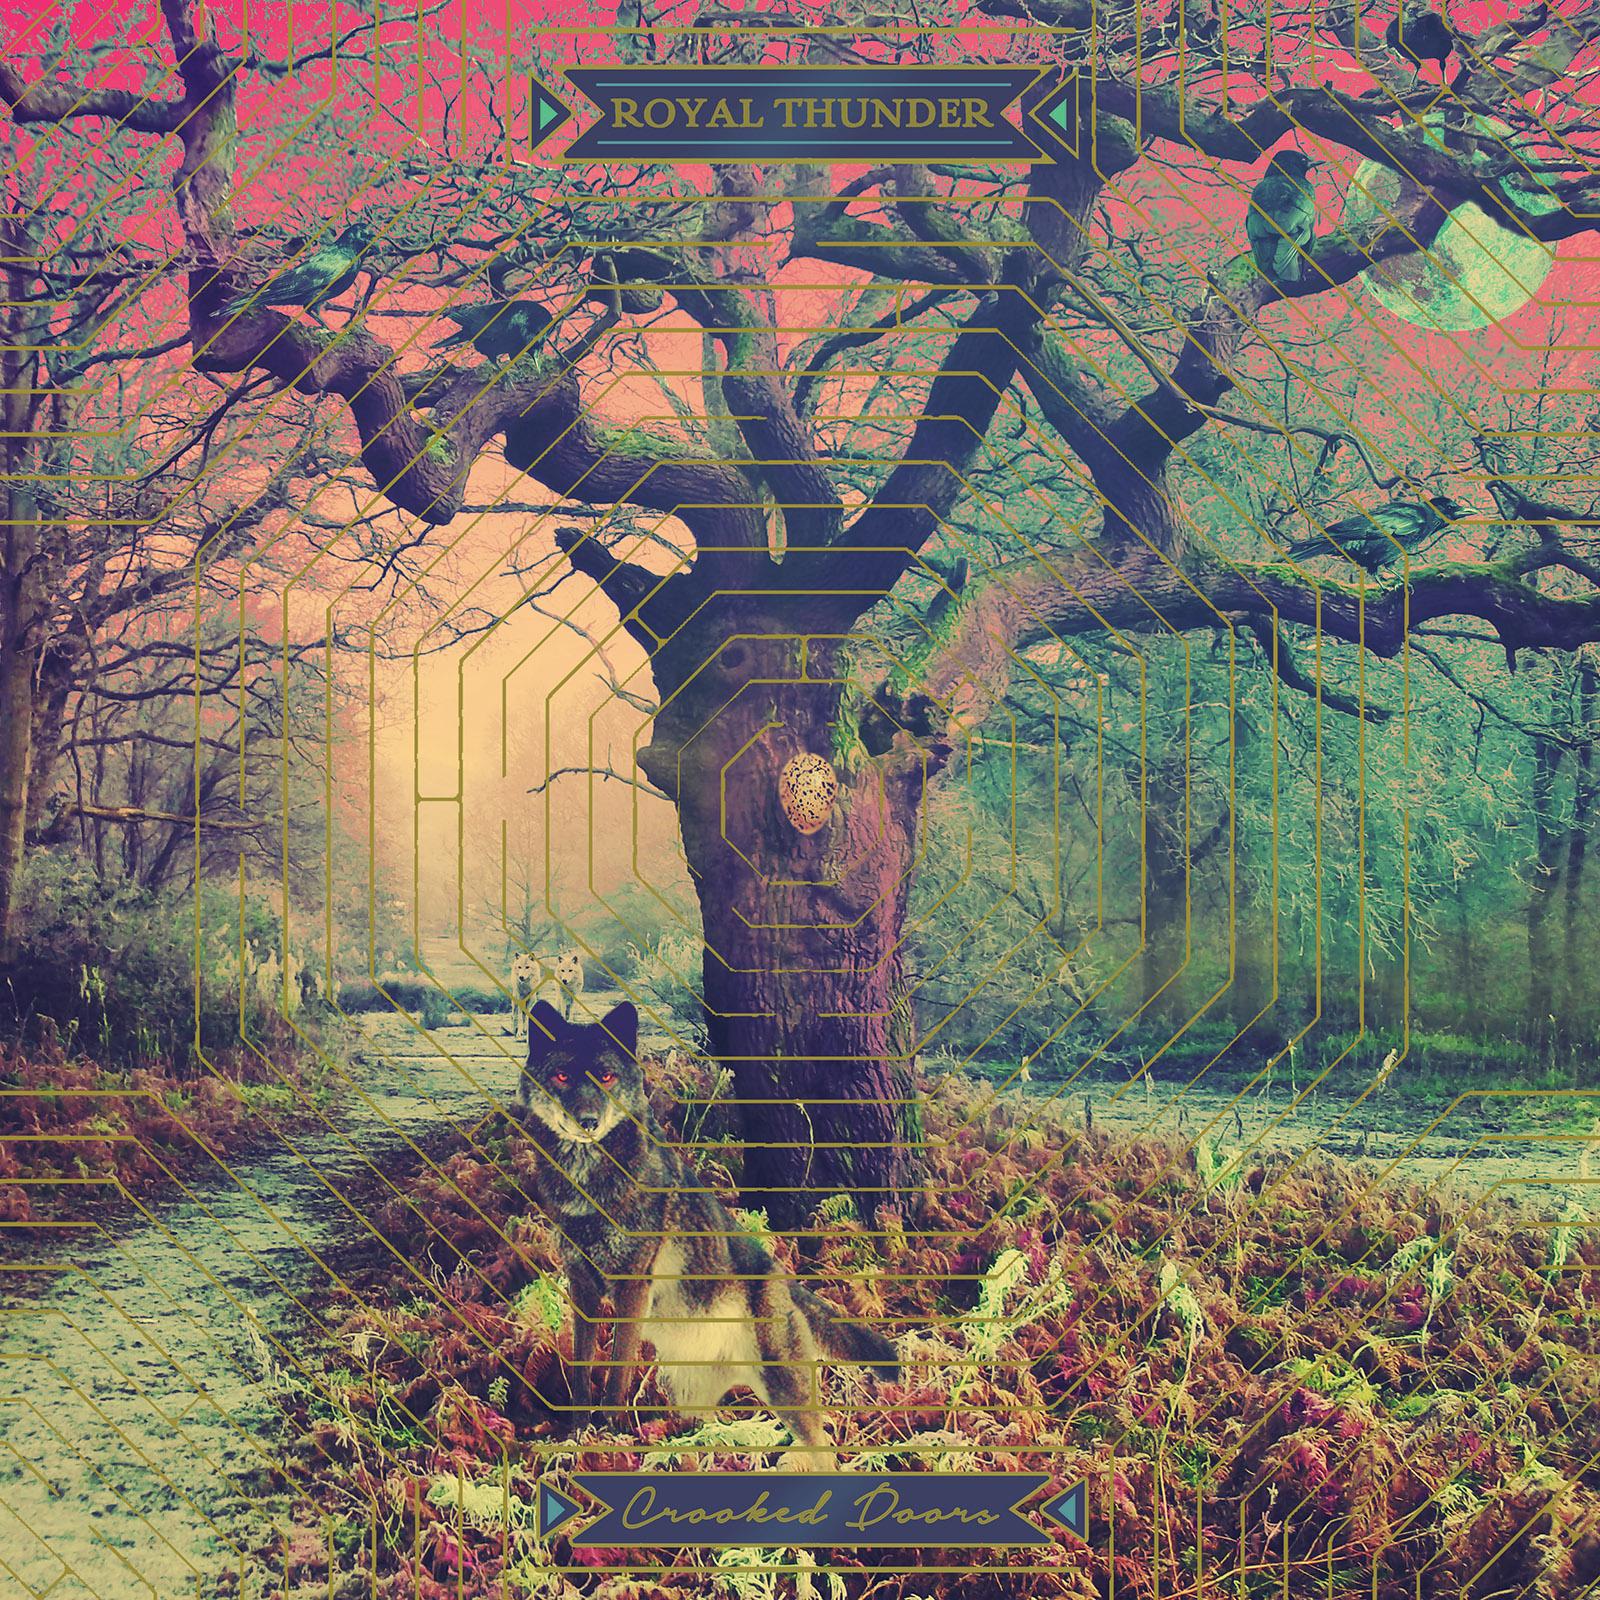 Royal Thunder – Crooked Doors Review